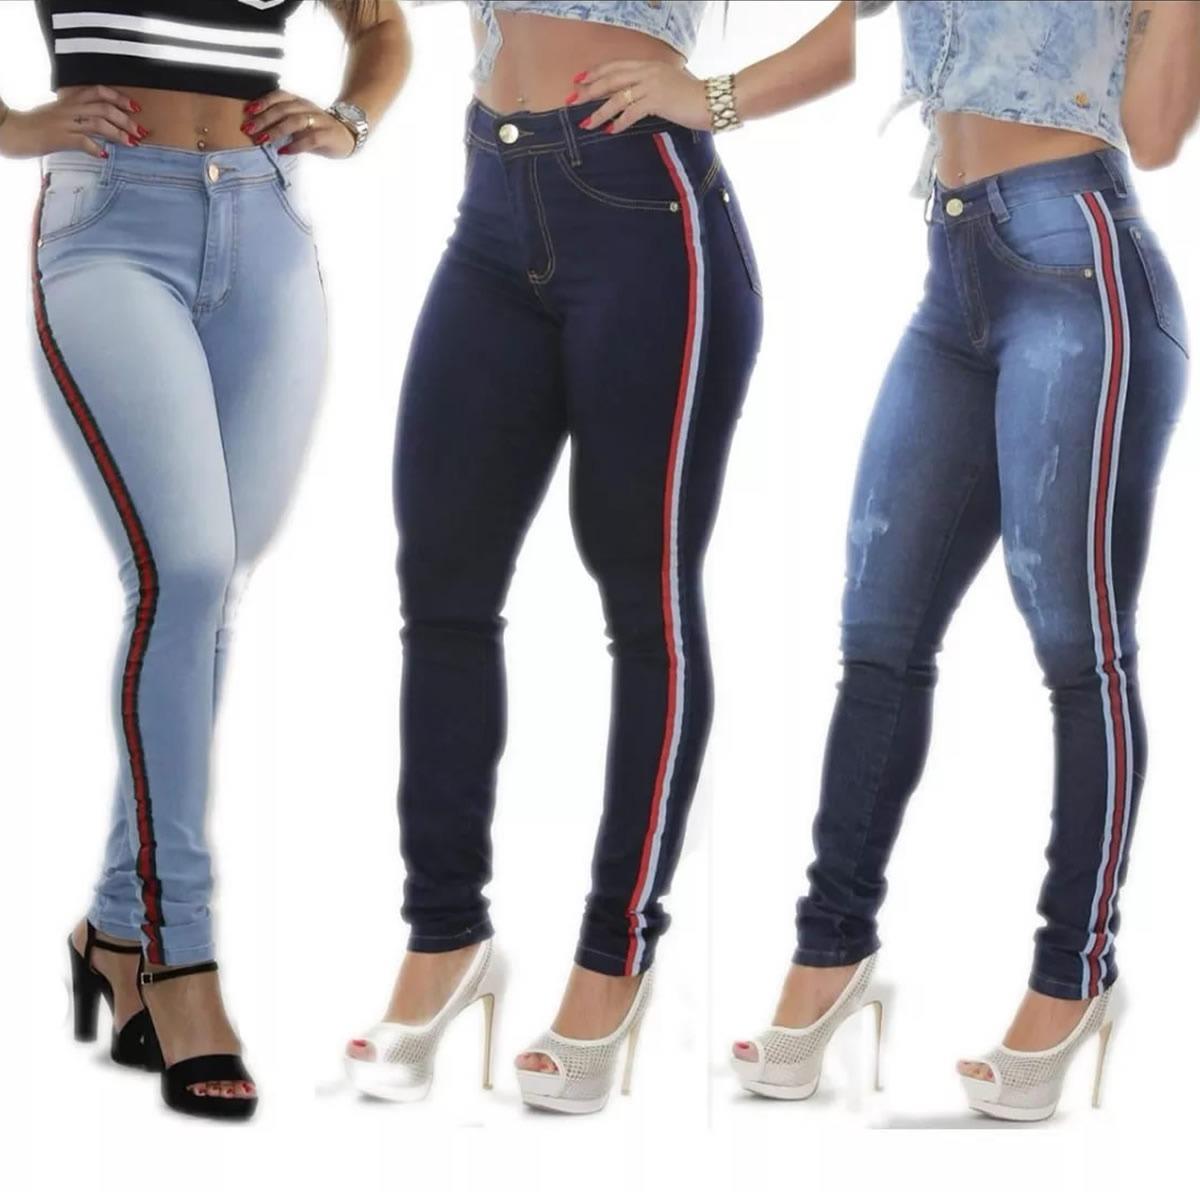 Calça Jeans Feminina Hot Levanta Bumbum Cintura Alta Listra - R  48 ... 1ae0b186f89